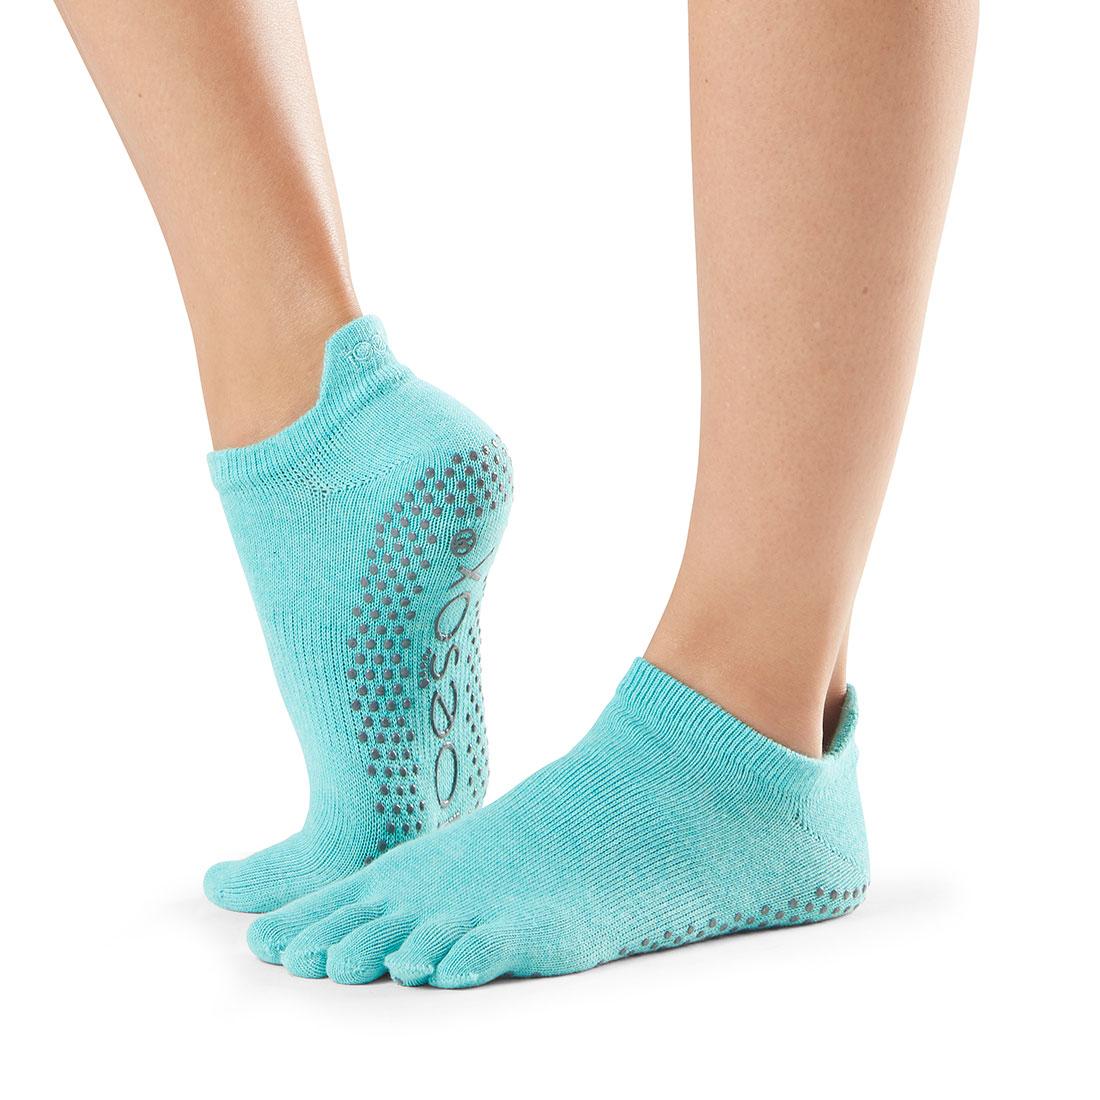 Yogasocken ToeSox Low Rise Full Toe Aqua